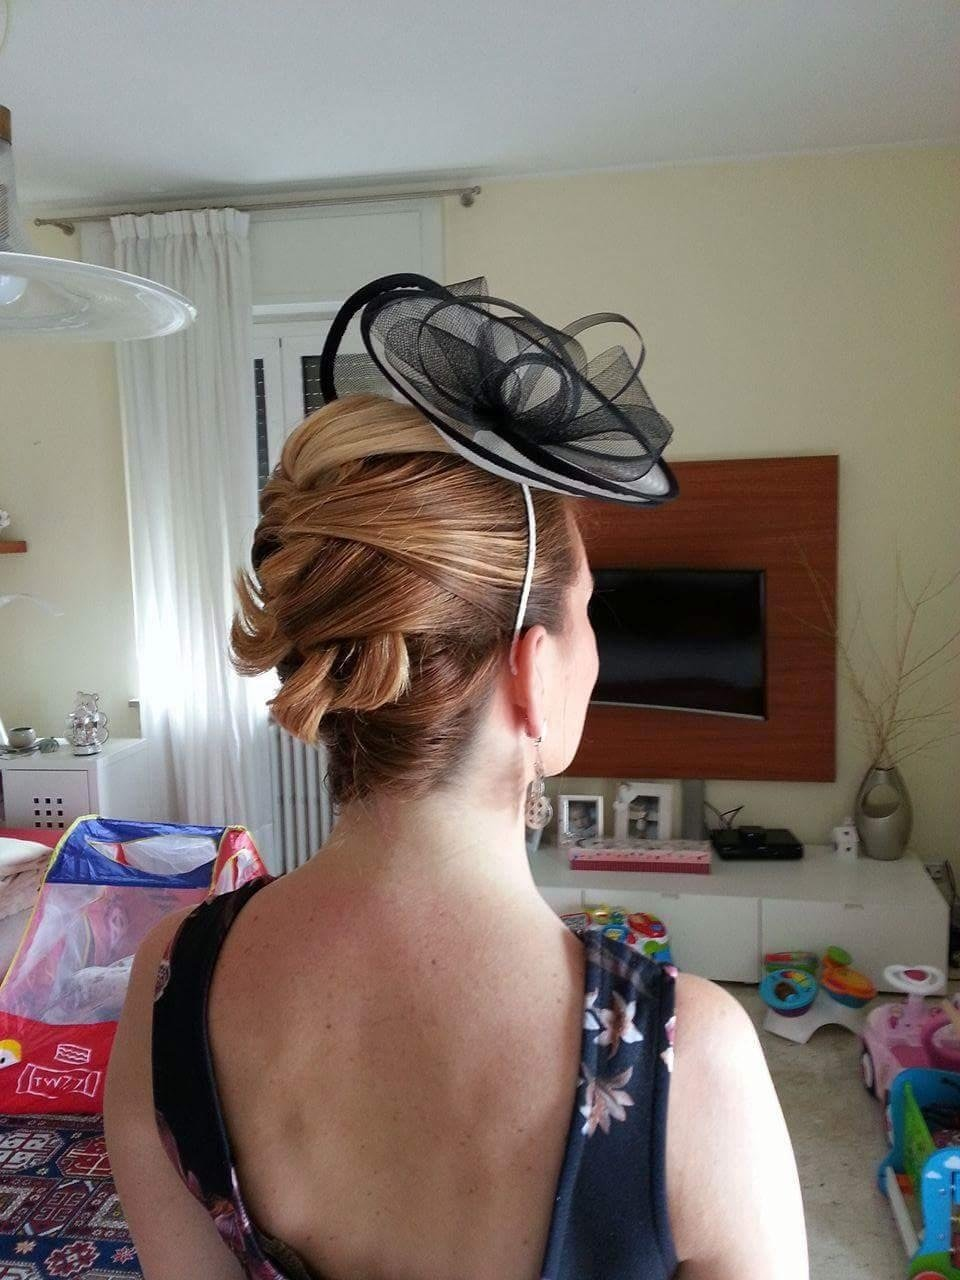 acconciature con cappellini